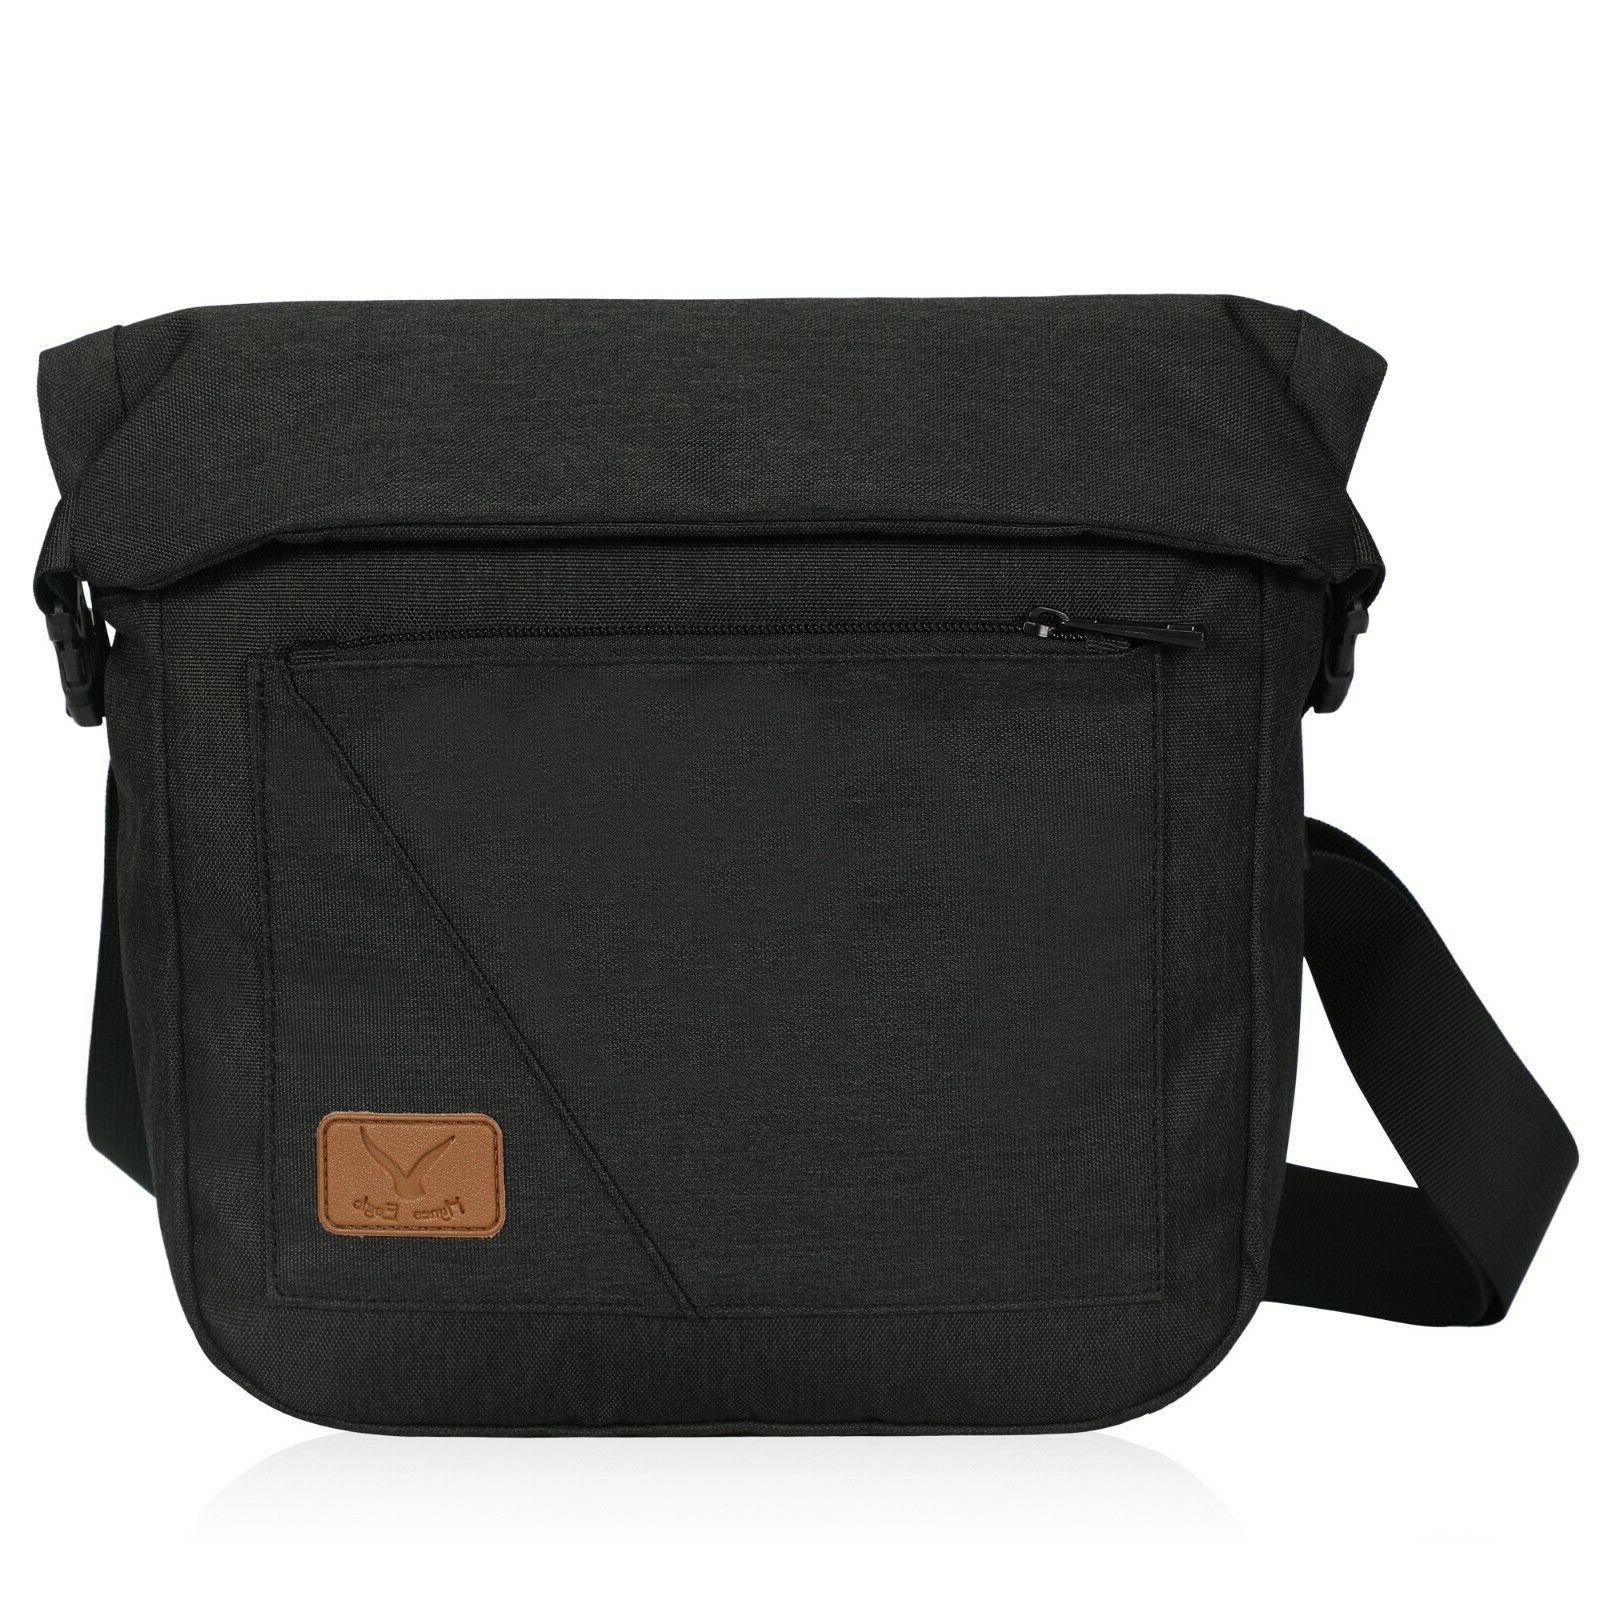 Hynes Eagle Anti Crossbody Purse Messenger Bag Bag